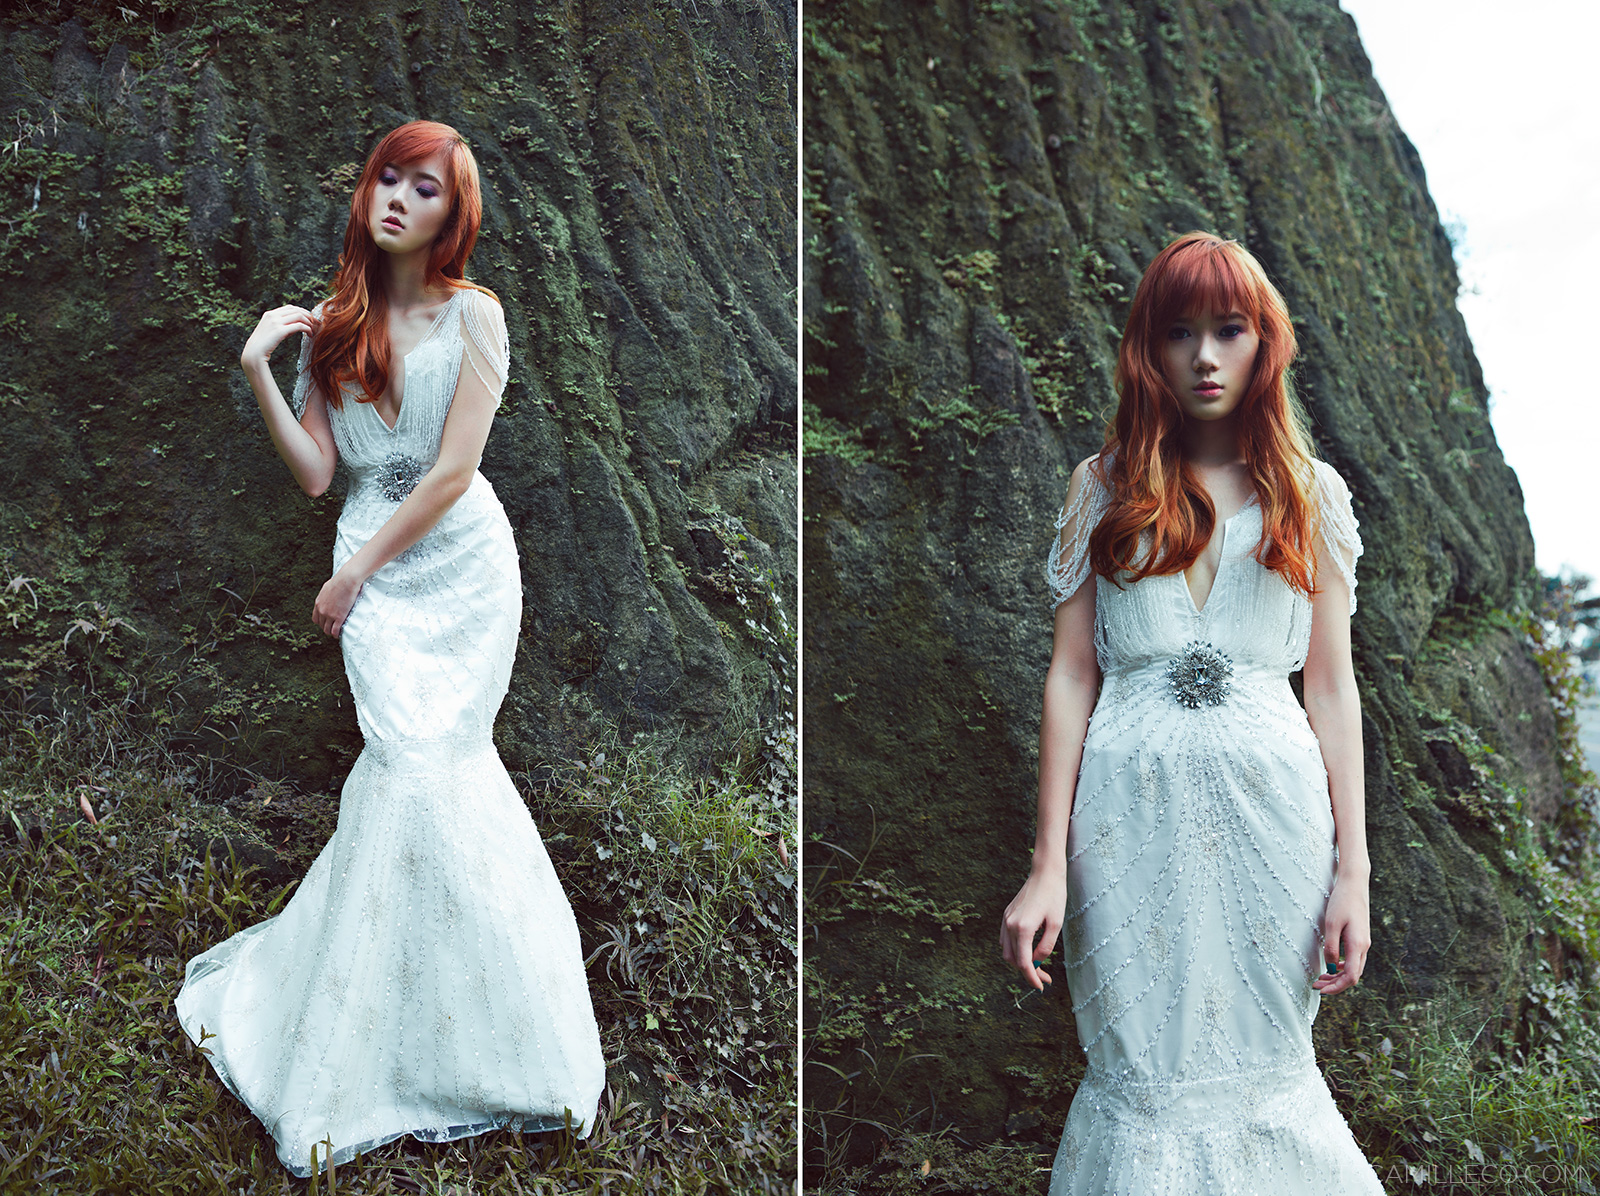 Corpse Bride Wedding Dress 27 Amazing Photos by Joseph Pascual